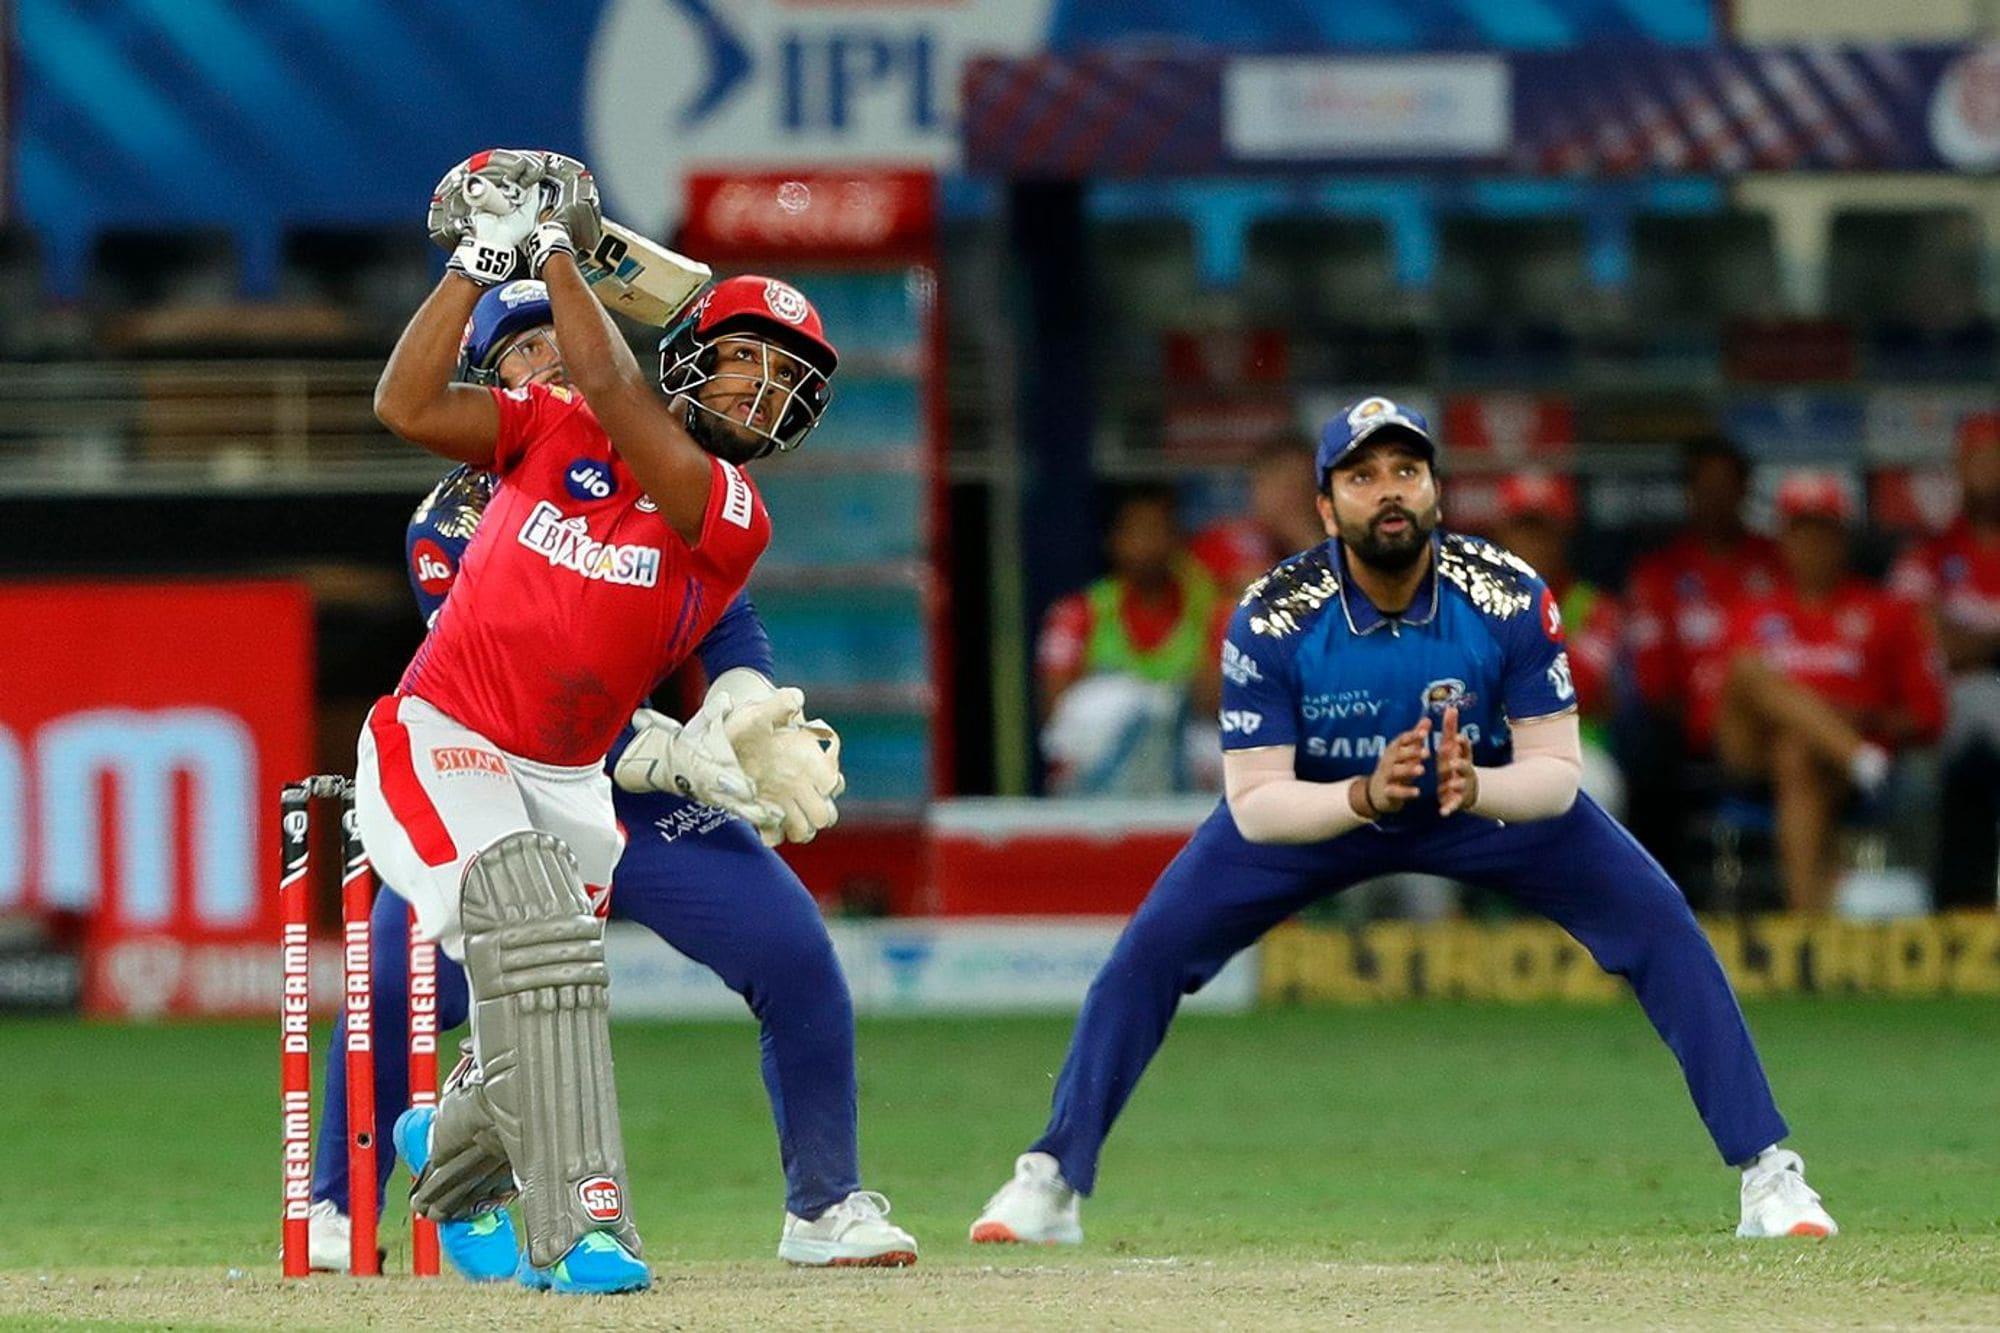 IPL 2020: In Pics, Mumbai Indians vs Kings XI Punjab, Match 36 in Dubai